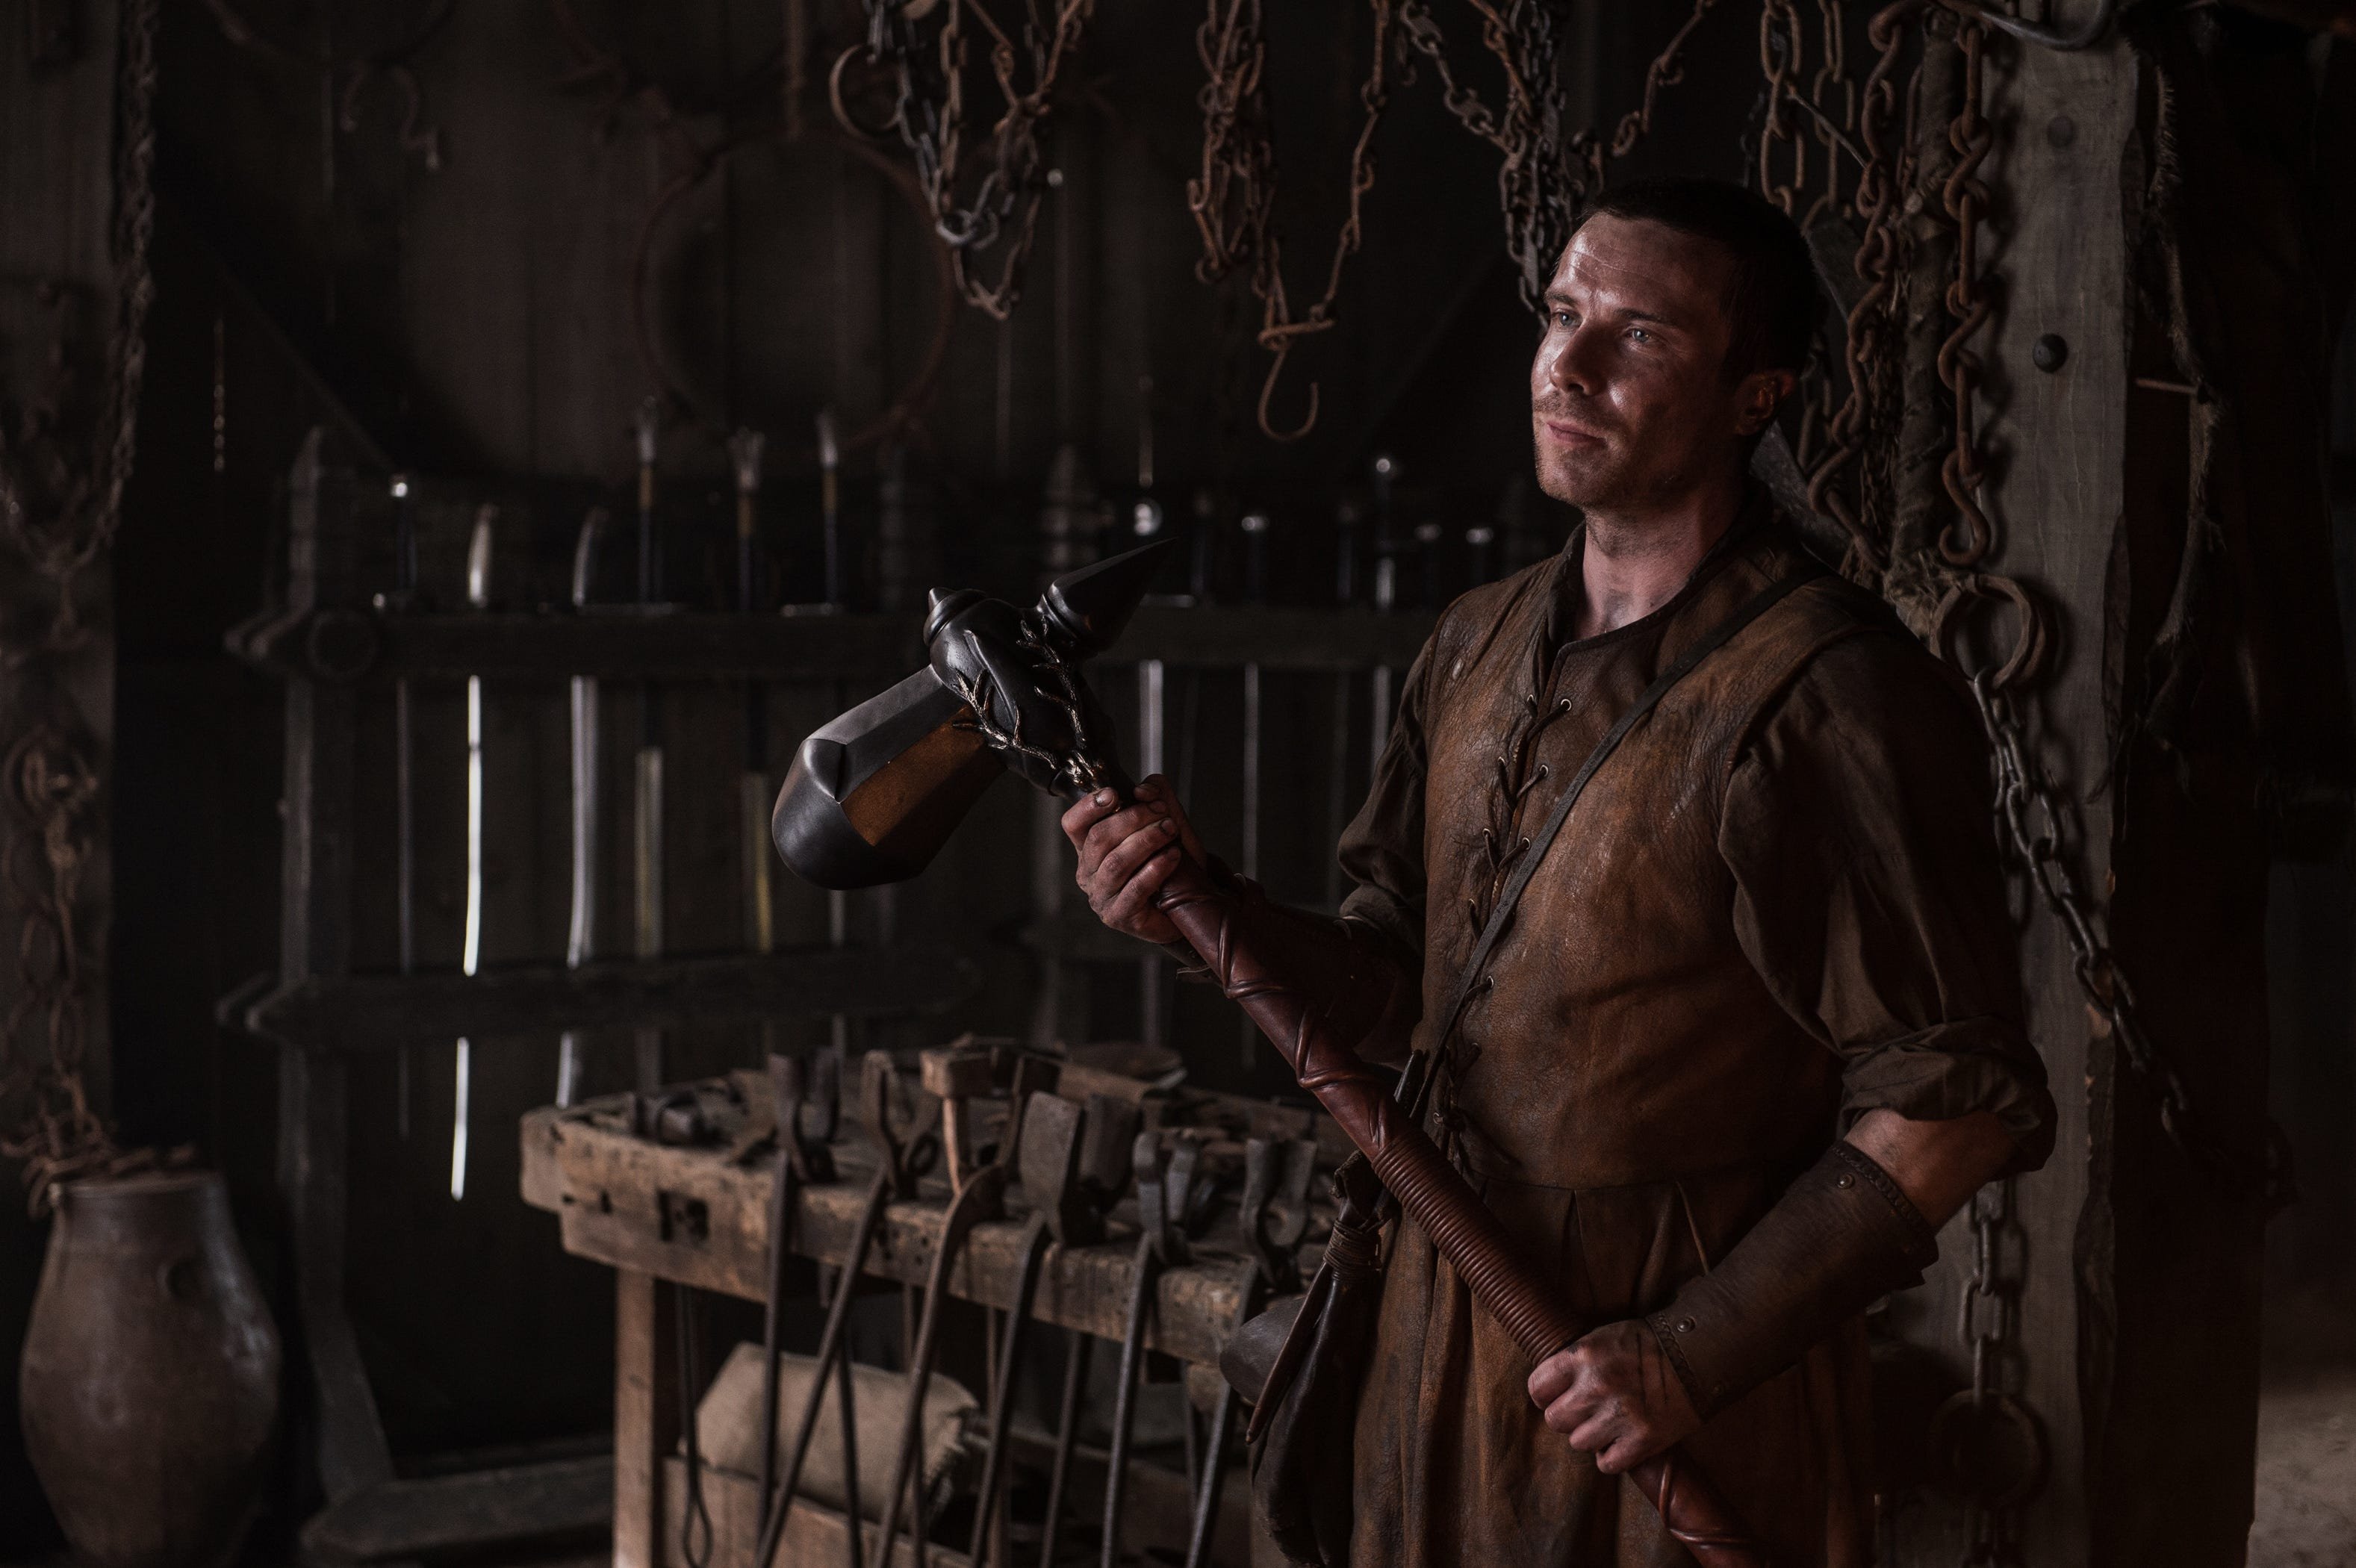 These Arya & Gendry Game of Thrones Theories Involve Romance & The Iron Throne